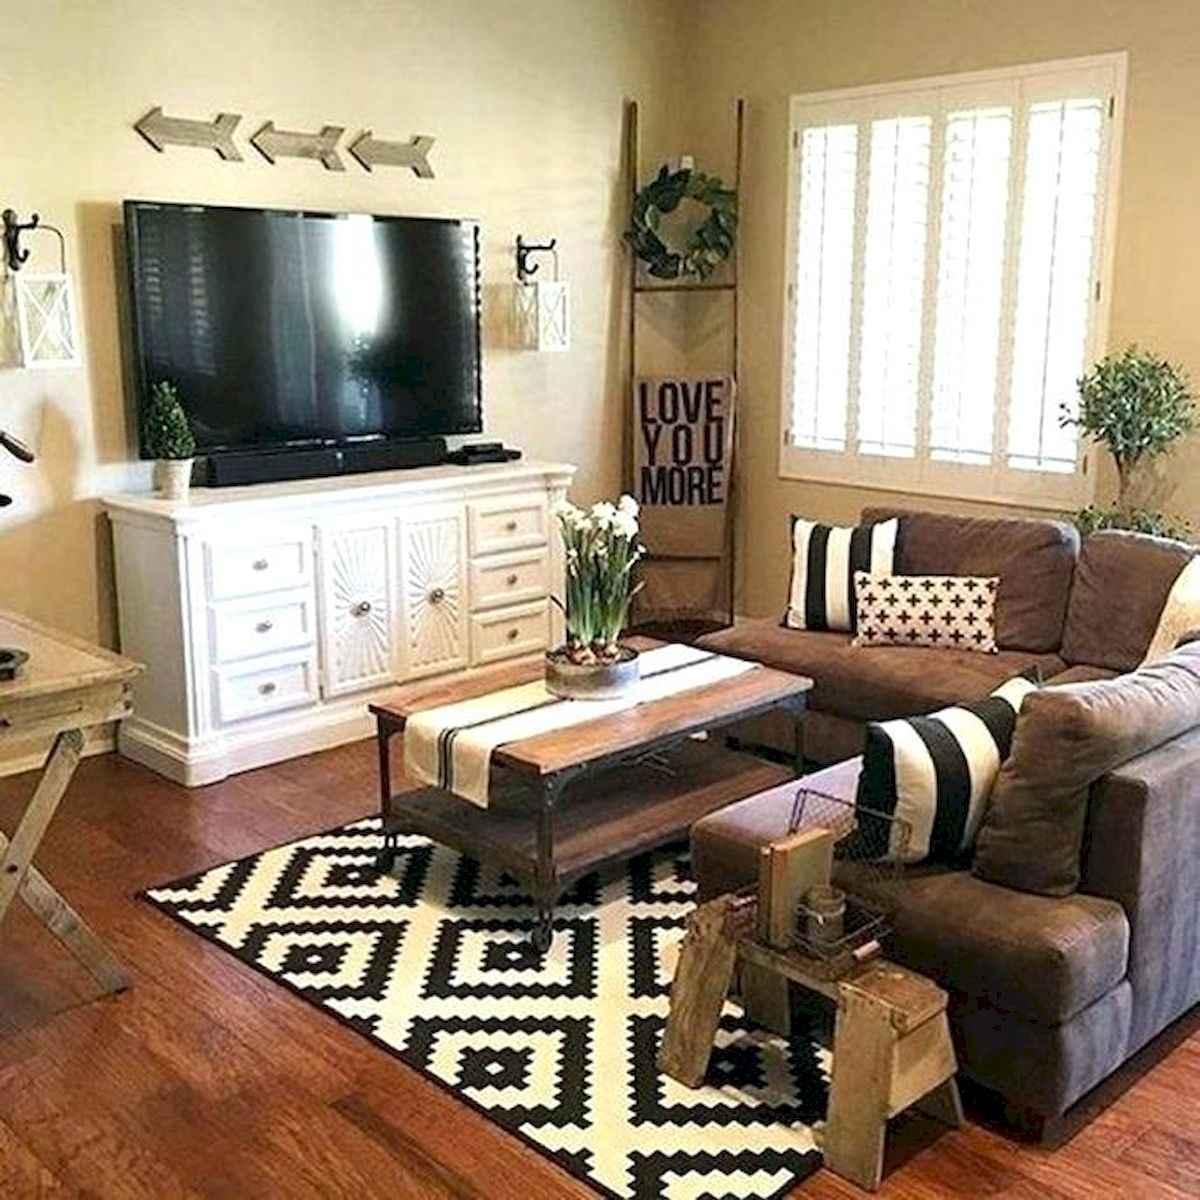 50 Rustic Farmhouse Living Room Decor Ideas (40)